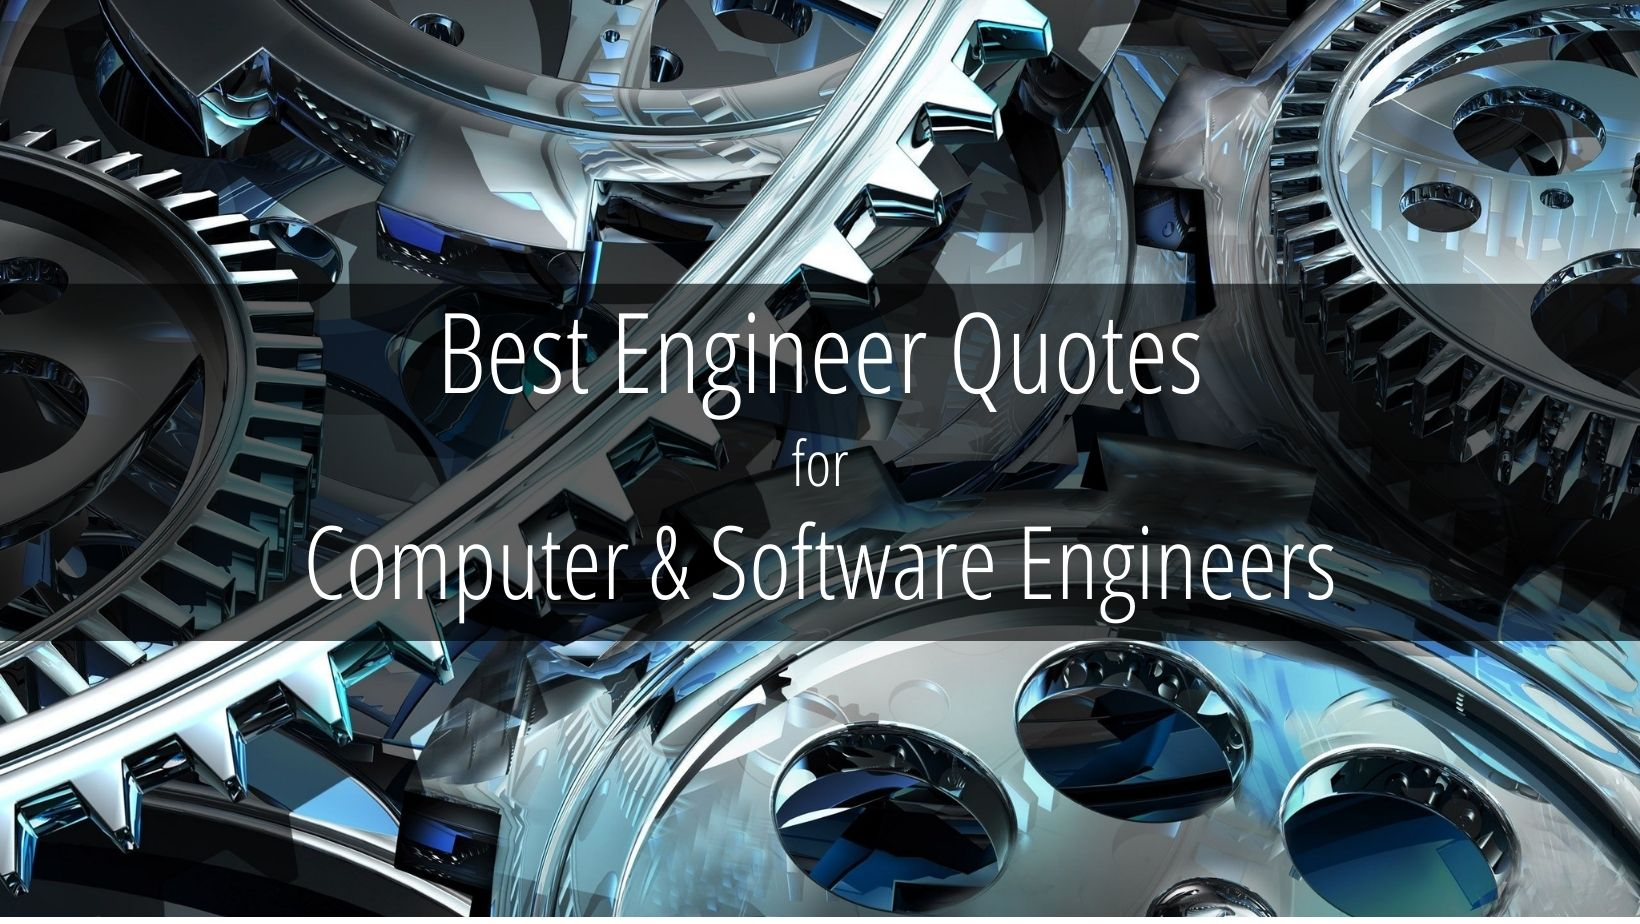 Best Engineer Quotes